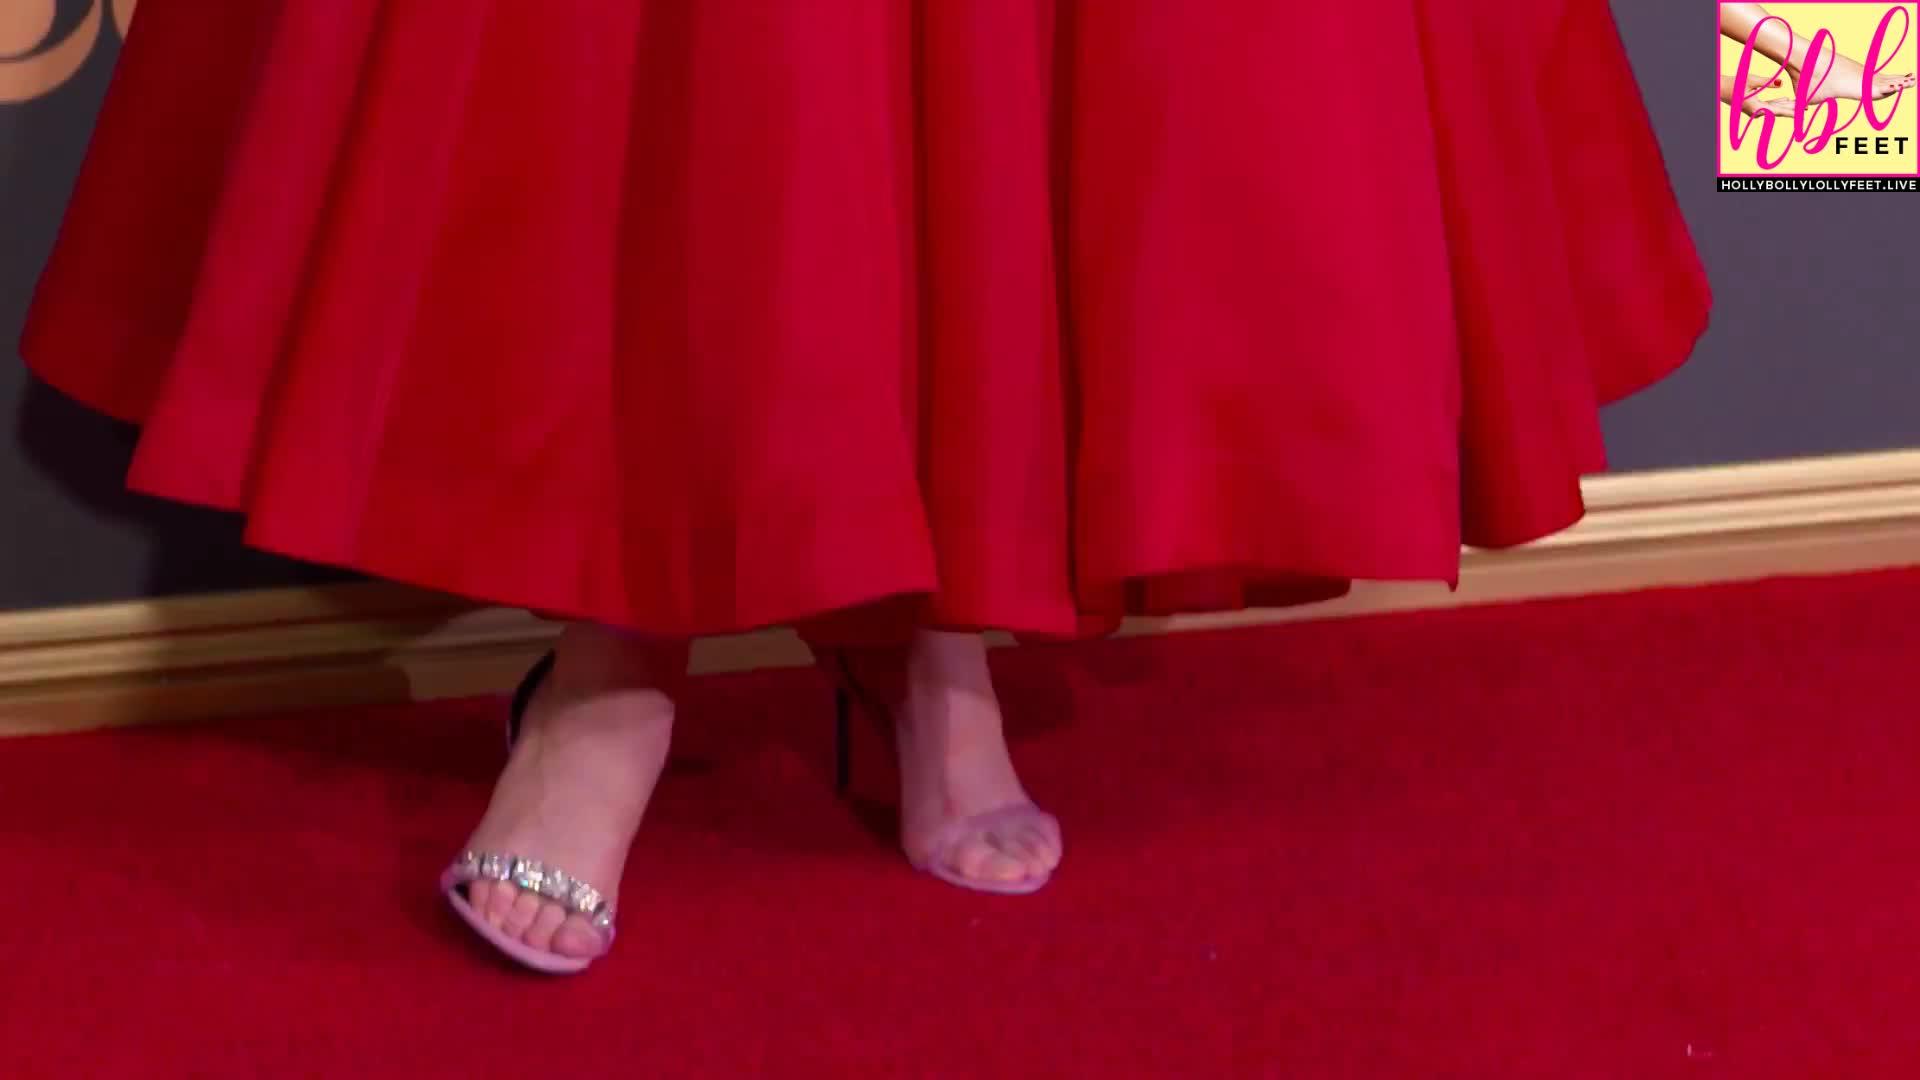 Nicole Kidman Feet Soles Wwwmiifotoscom